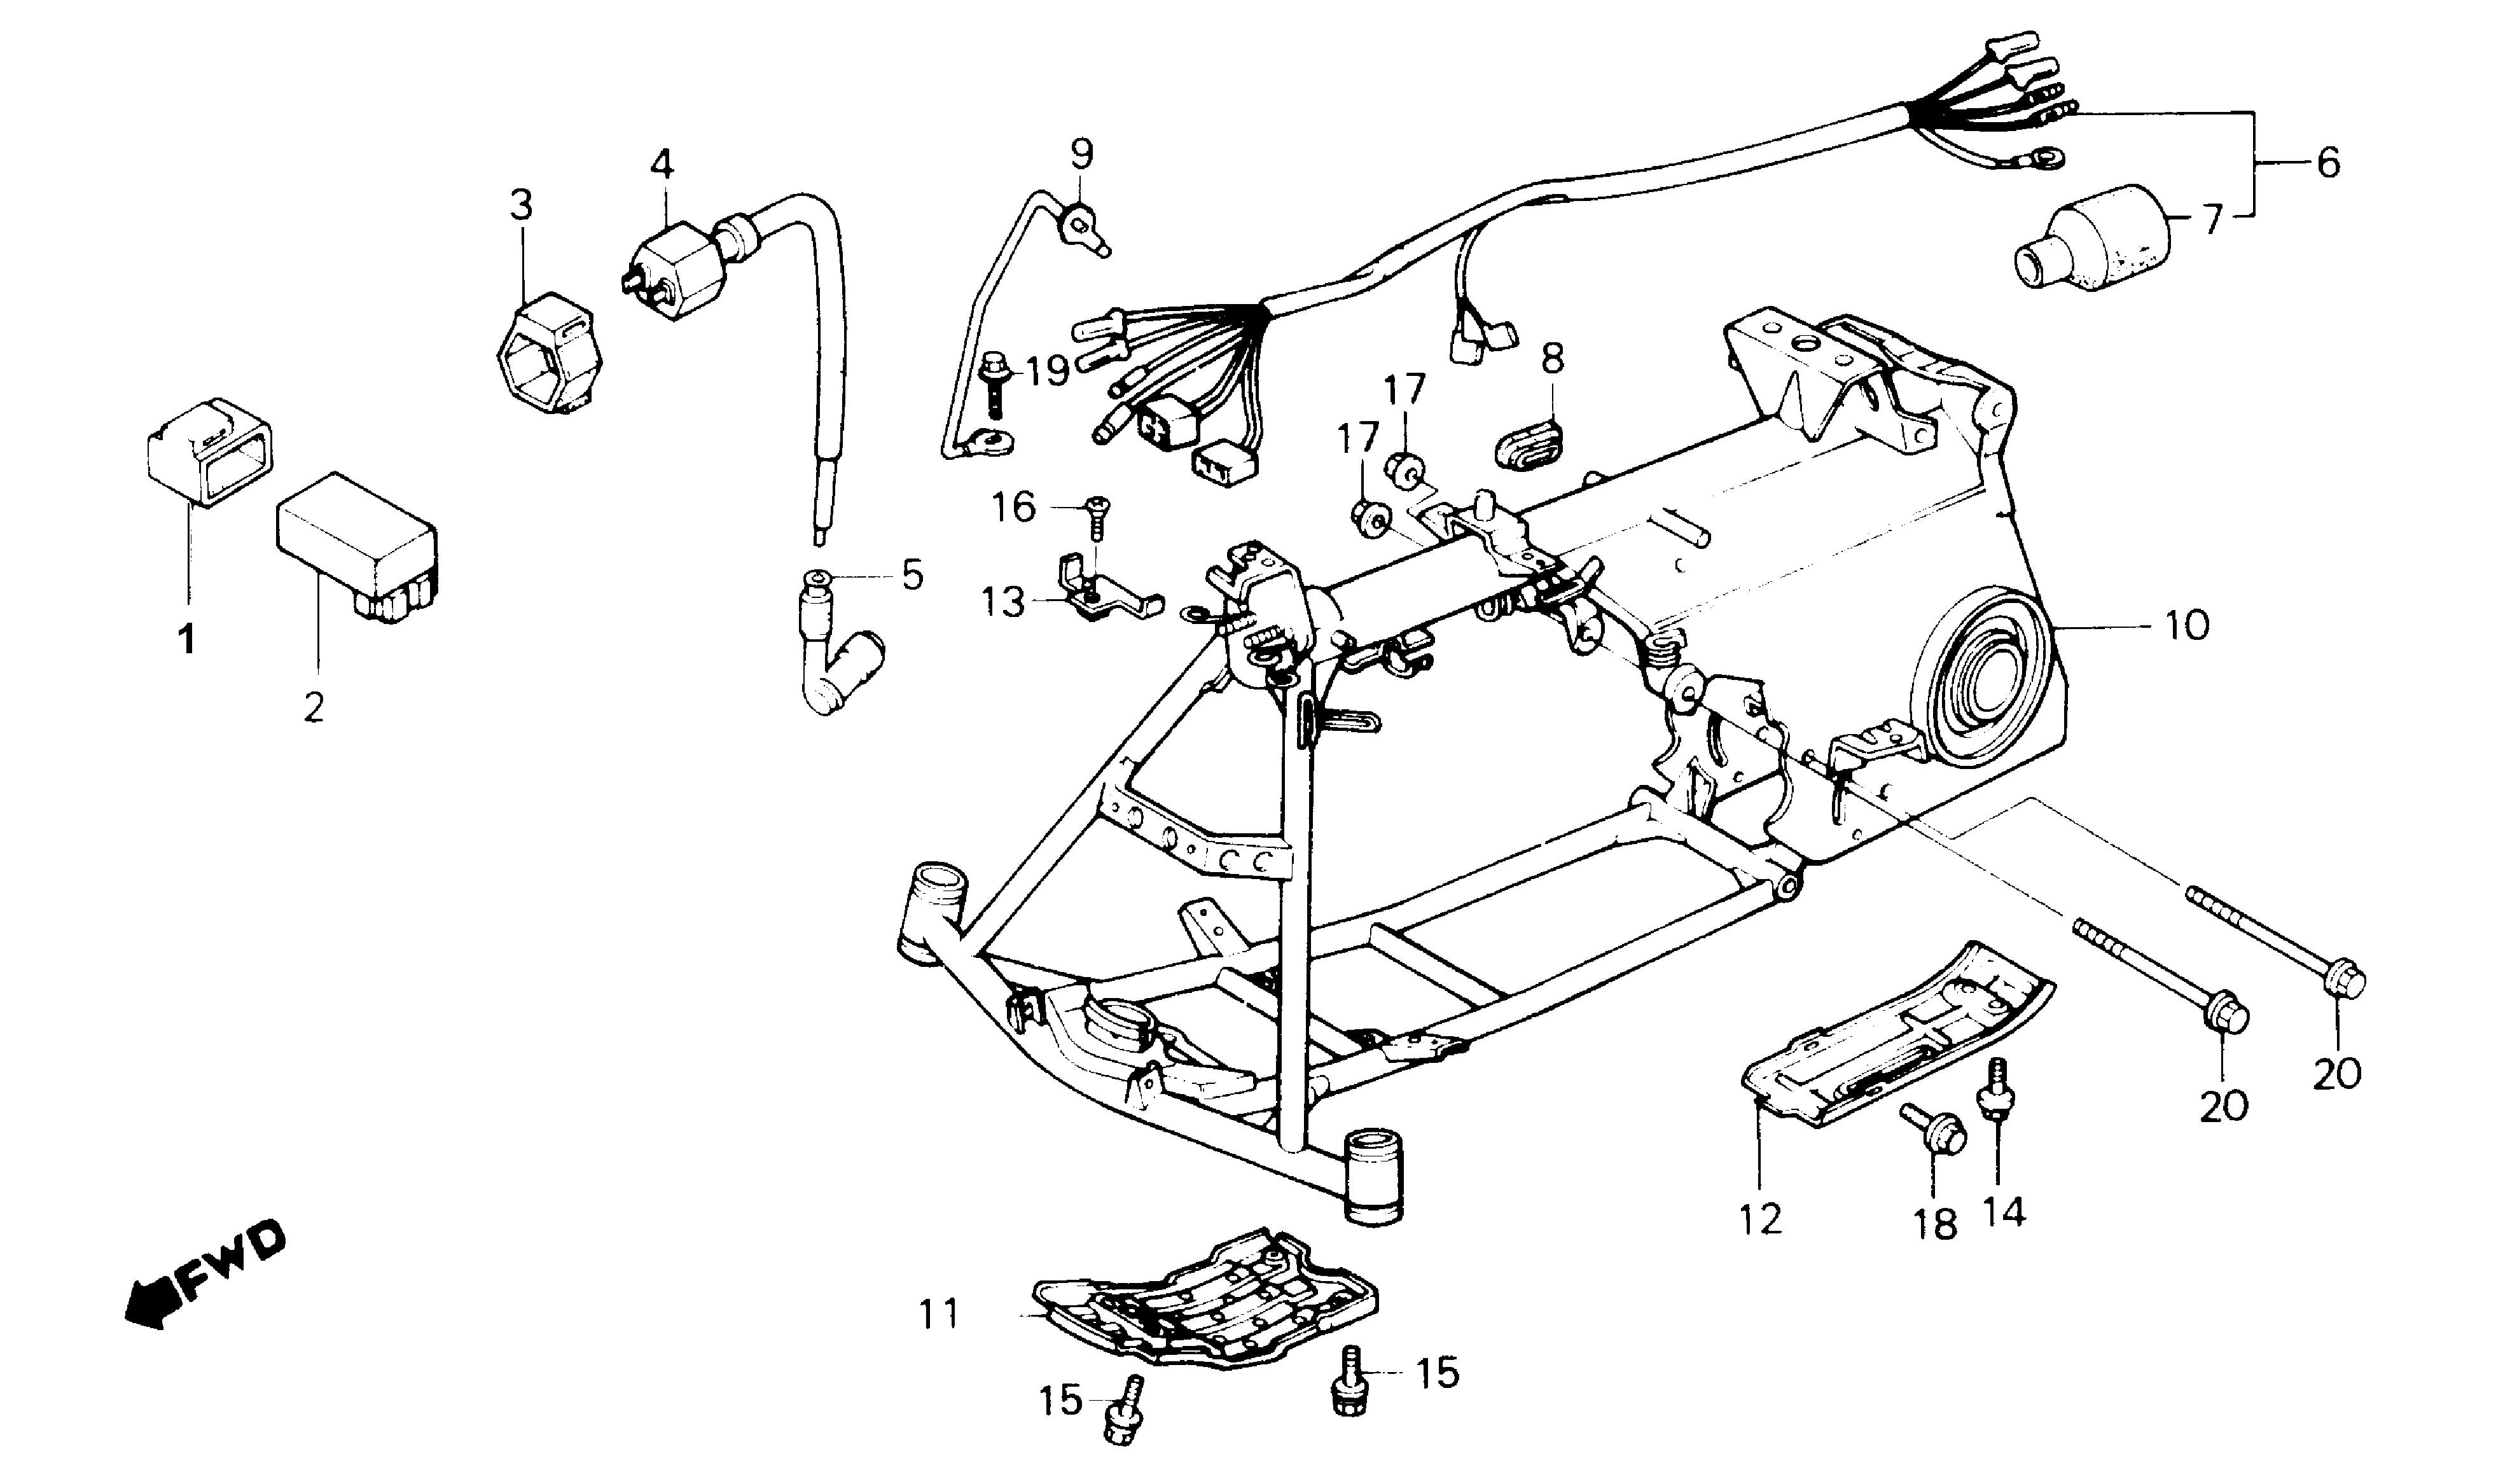 [DIAGRAM] Honda Nq50 Wiring Diagram FULL Version HD